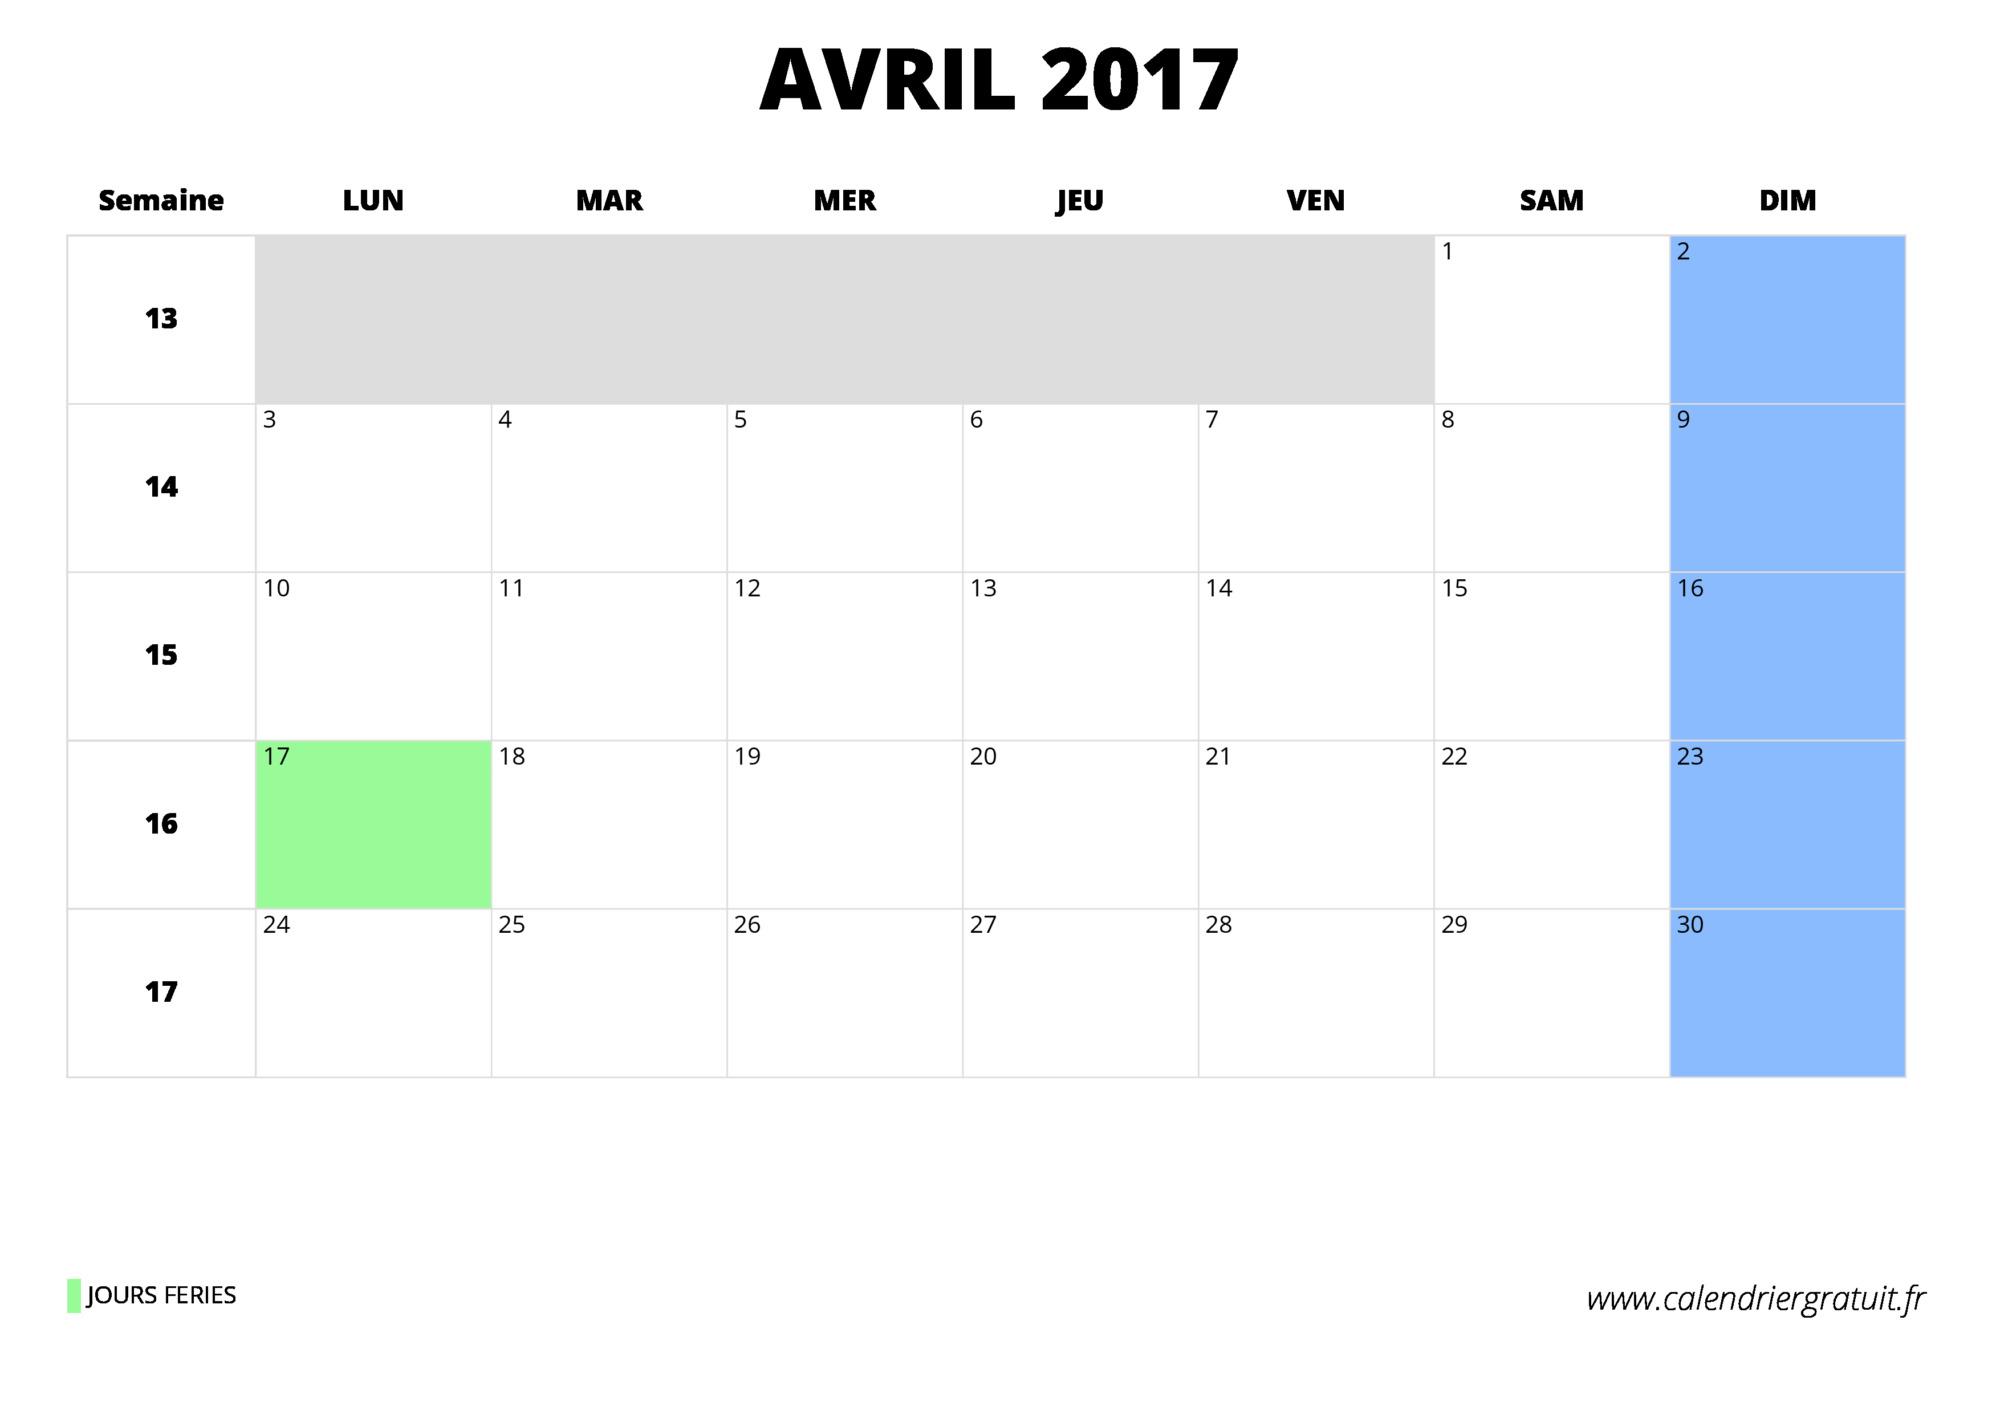 Calendrier avril 2017 imprimer - Calendrier lune montant et descendante 2017 ...